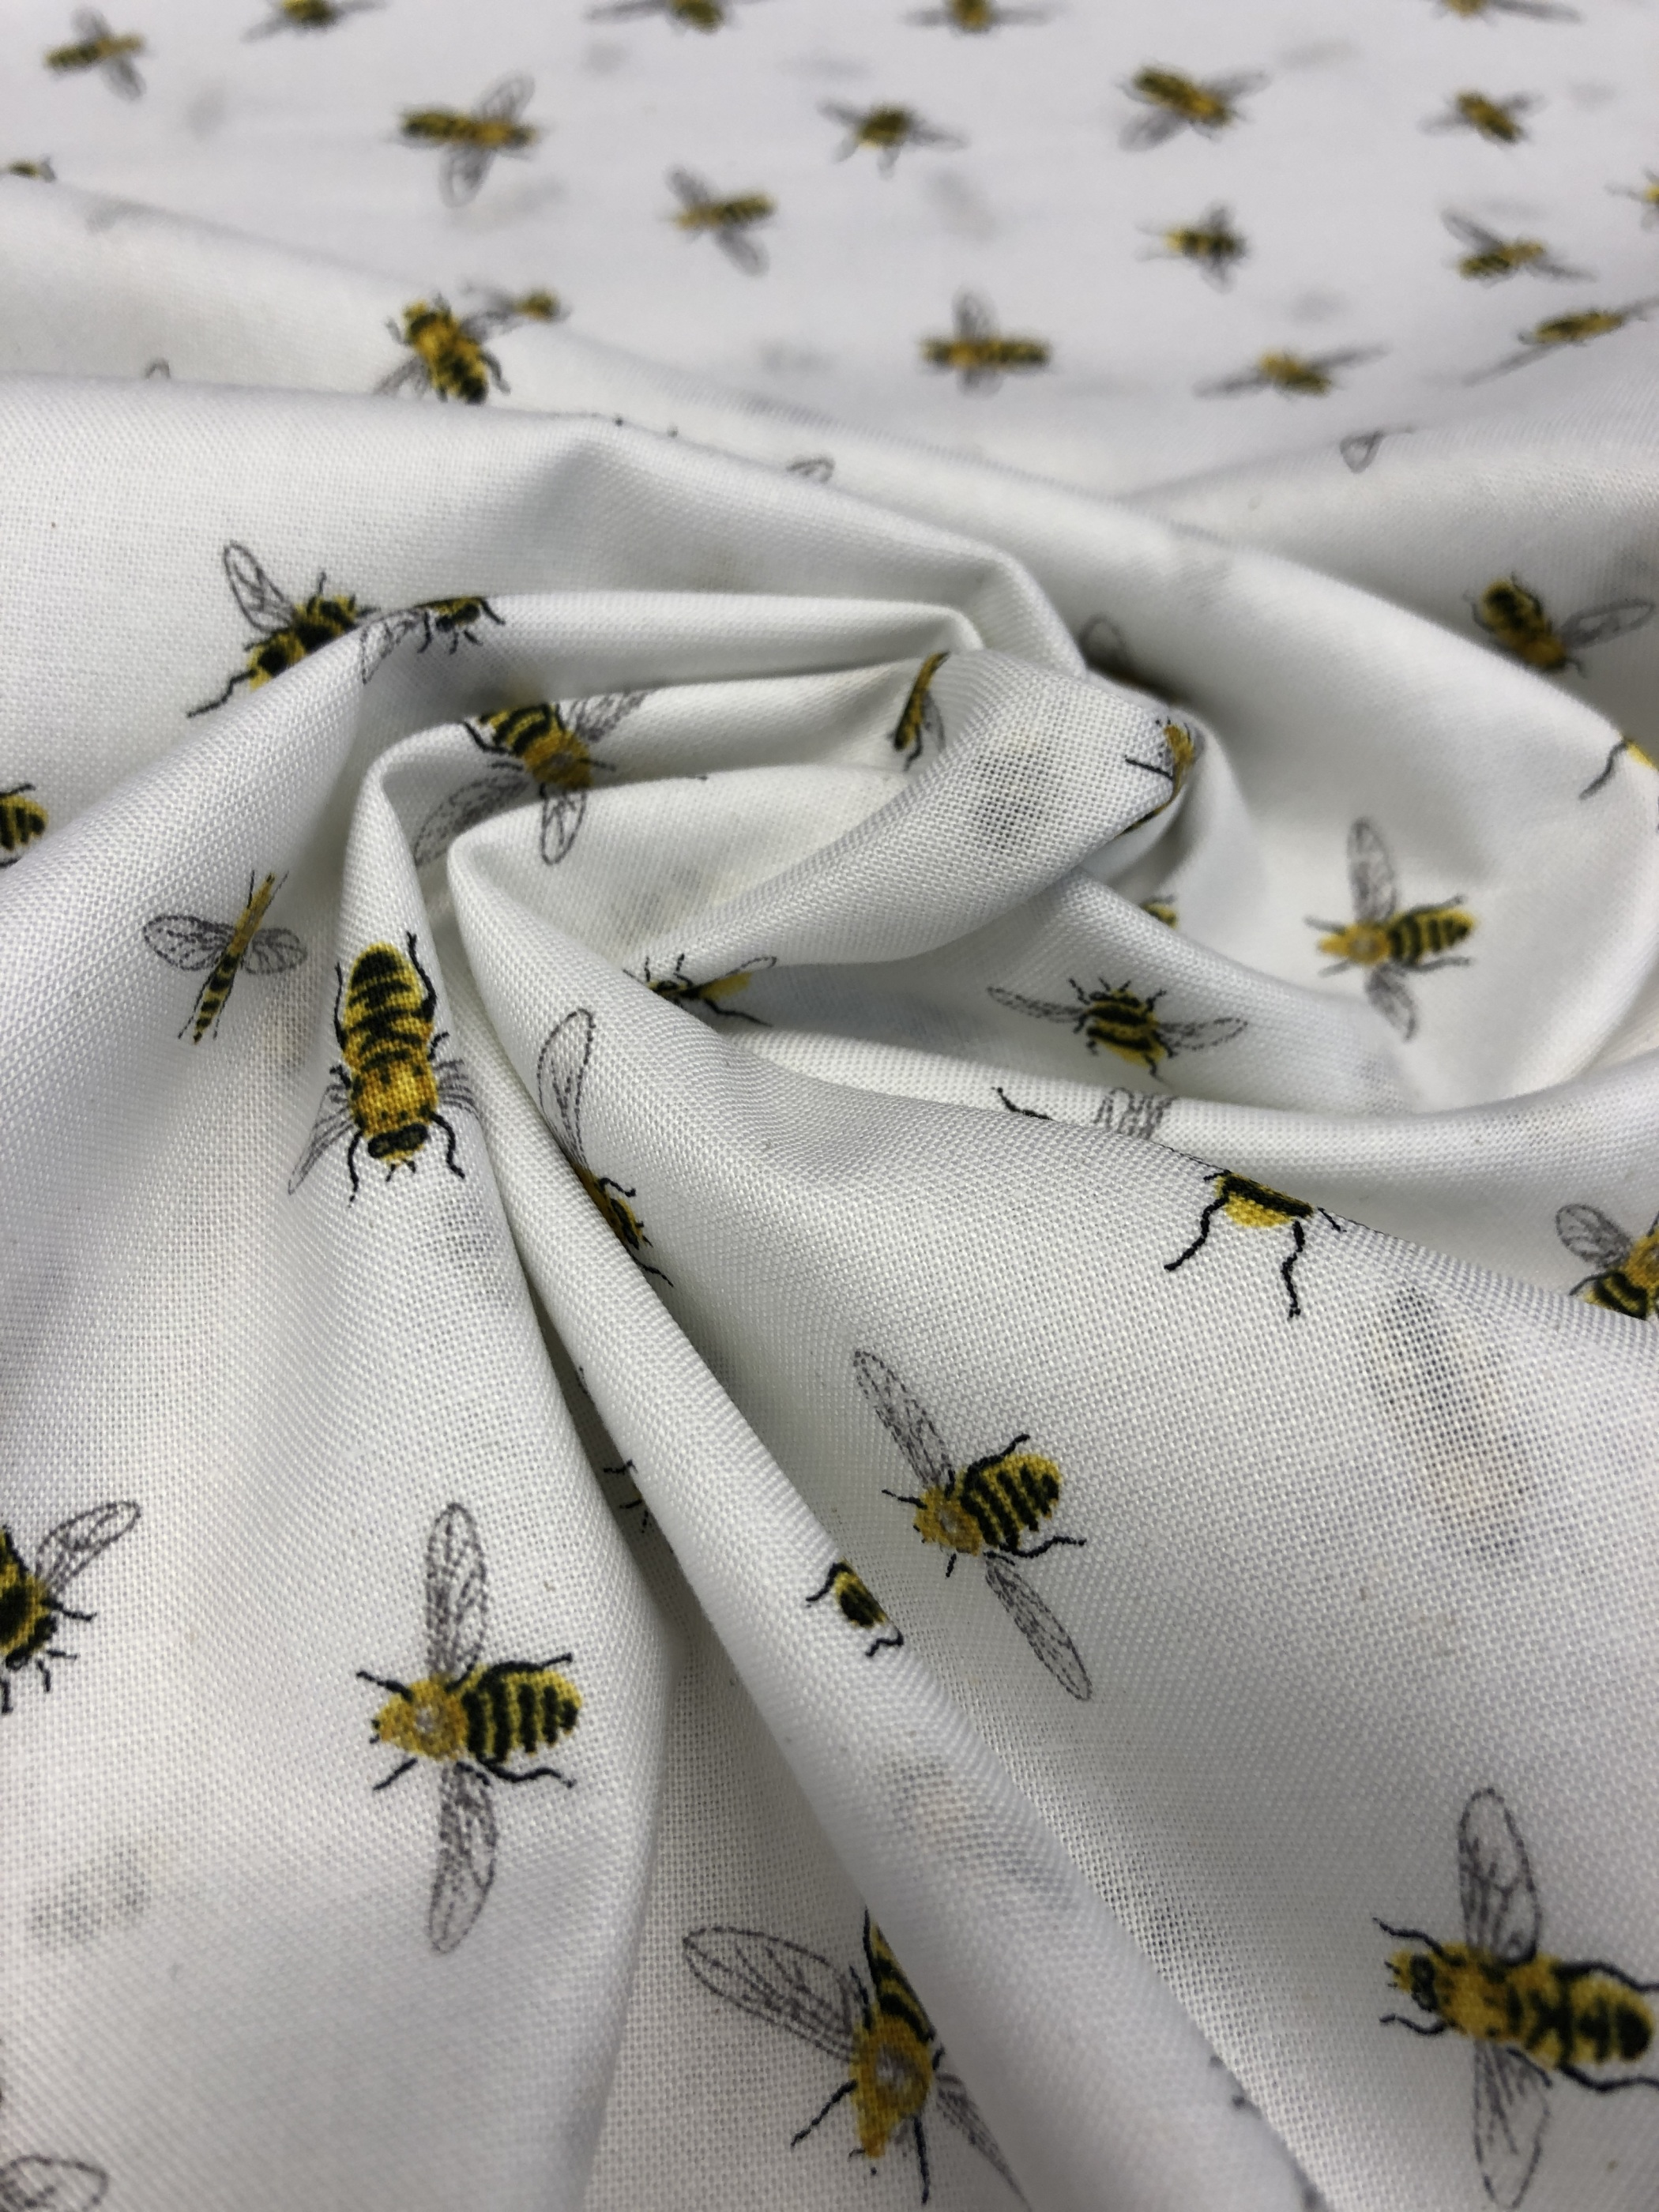 vitt vit bin bi lilla metervara modetyg barntyg bomullsväv tyglust laholm